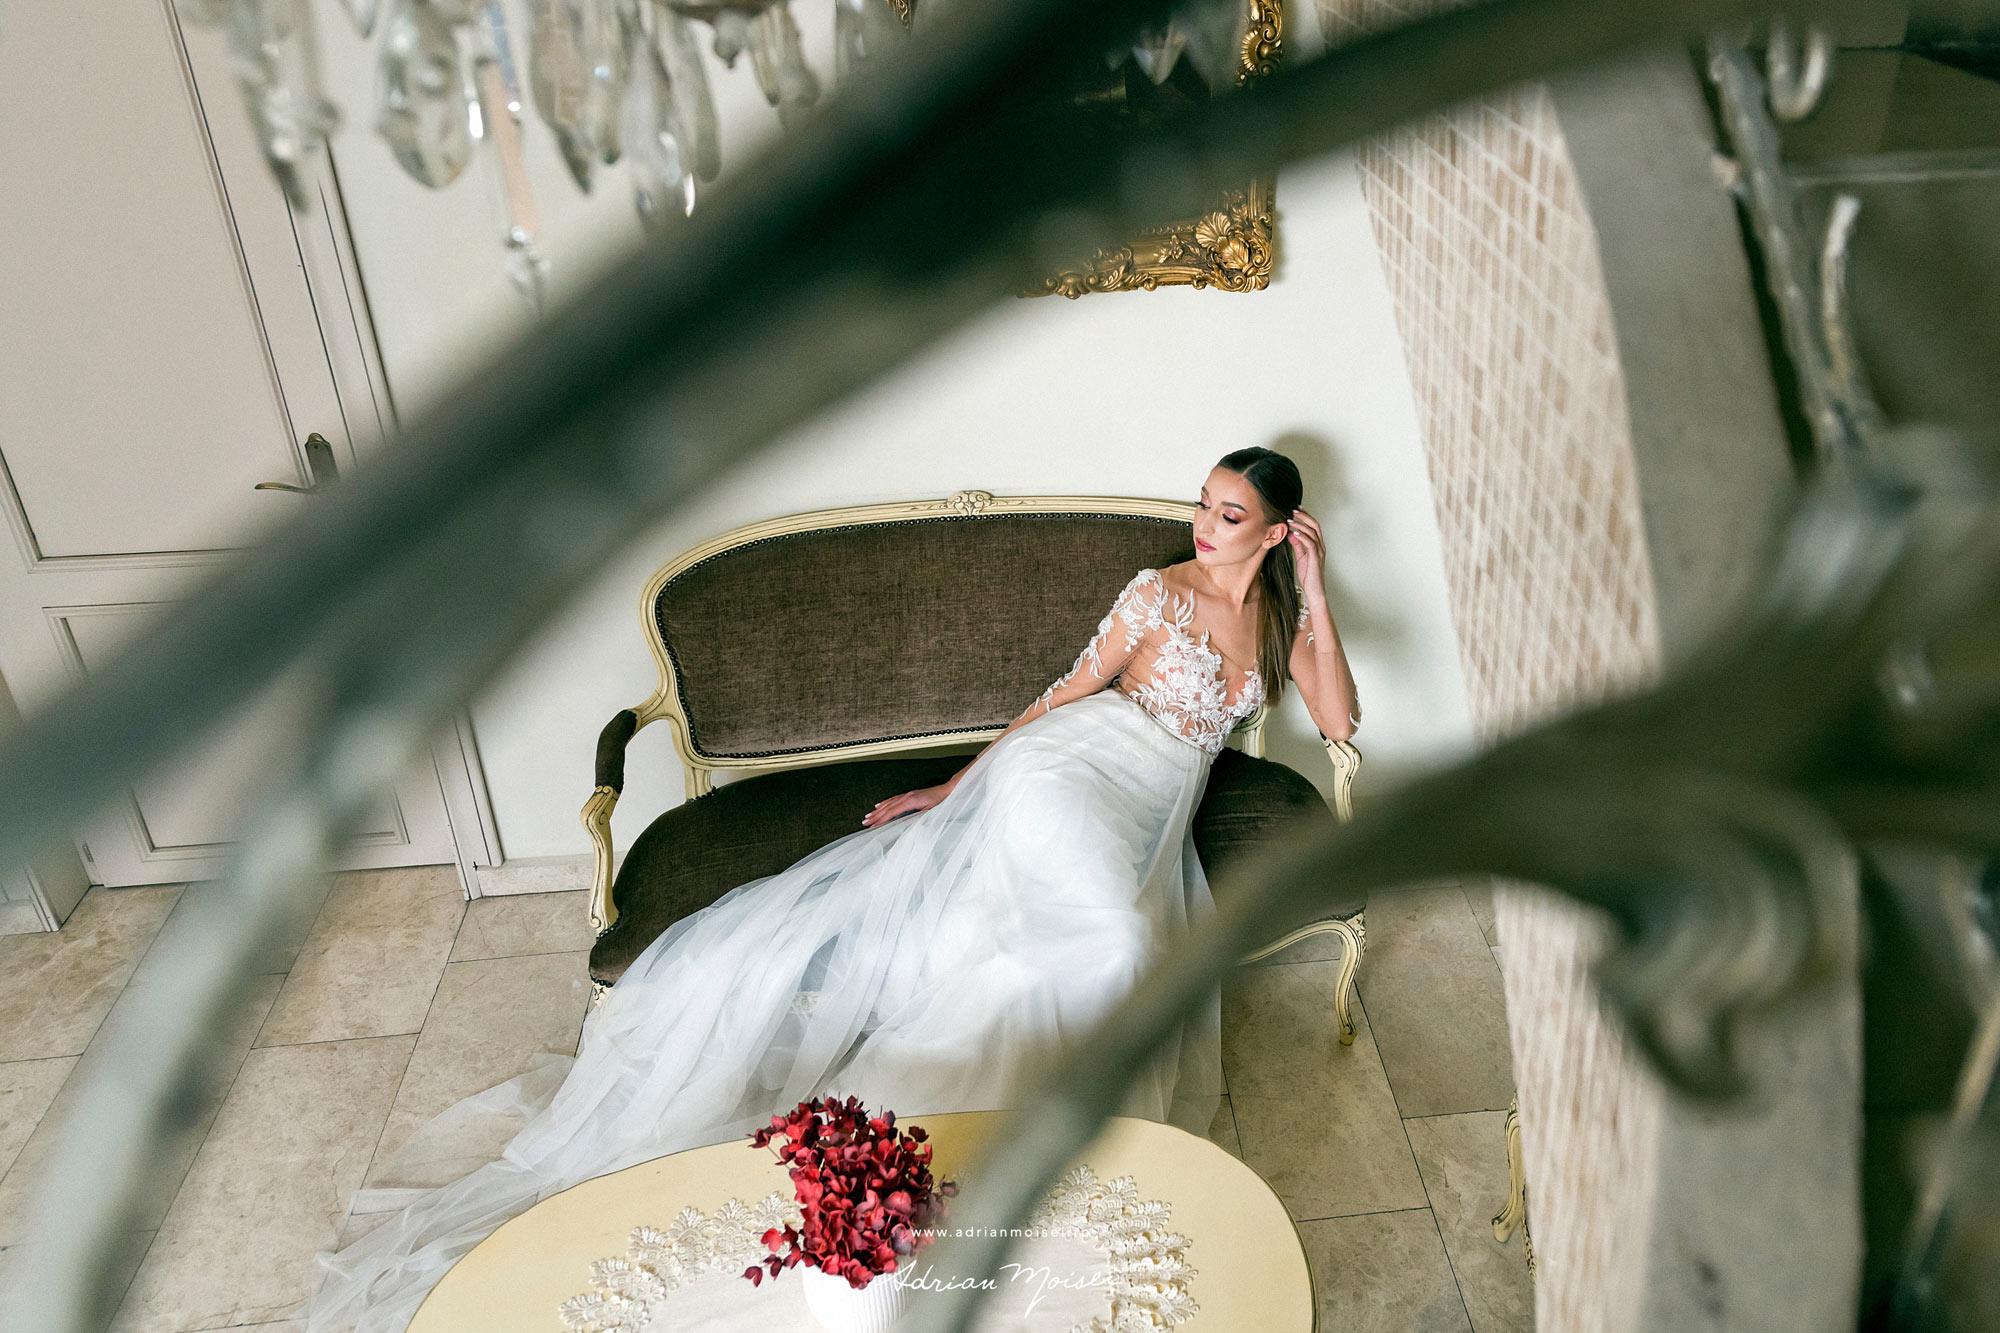 Fotograf produs Iasi. Fotograf nunta Ias. Marysten casa de moda - rochii de mireasa. Sedinta foto la studio foto video Adrian Moisei 2021 - 2022 colectia Luxury